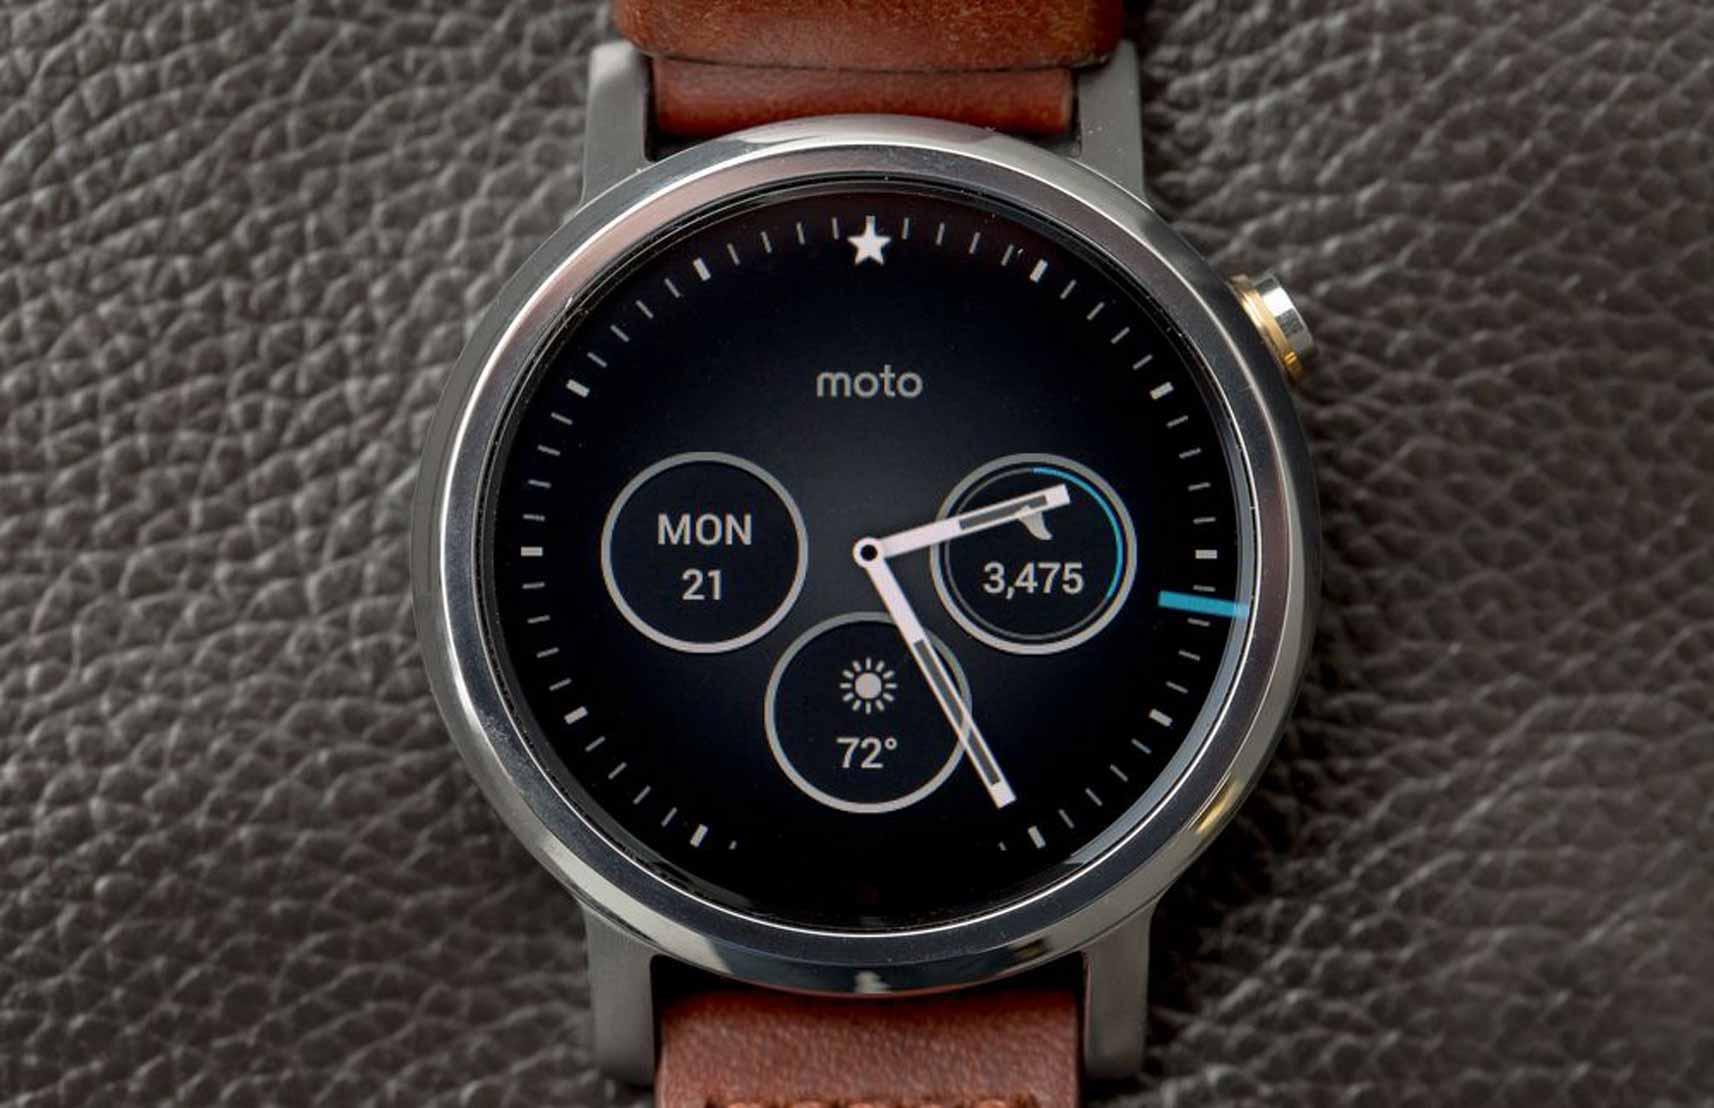 Moto-360-2-Smartwatch discount